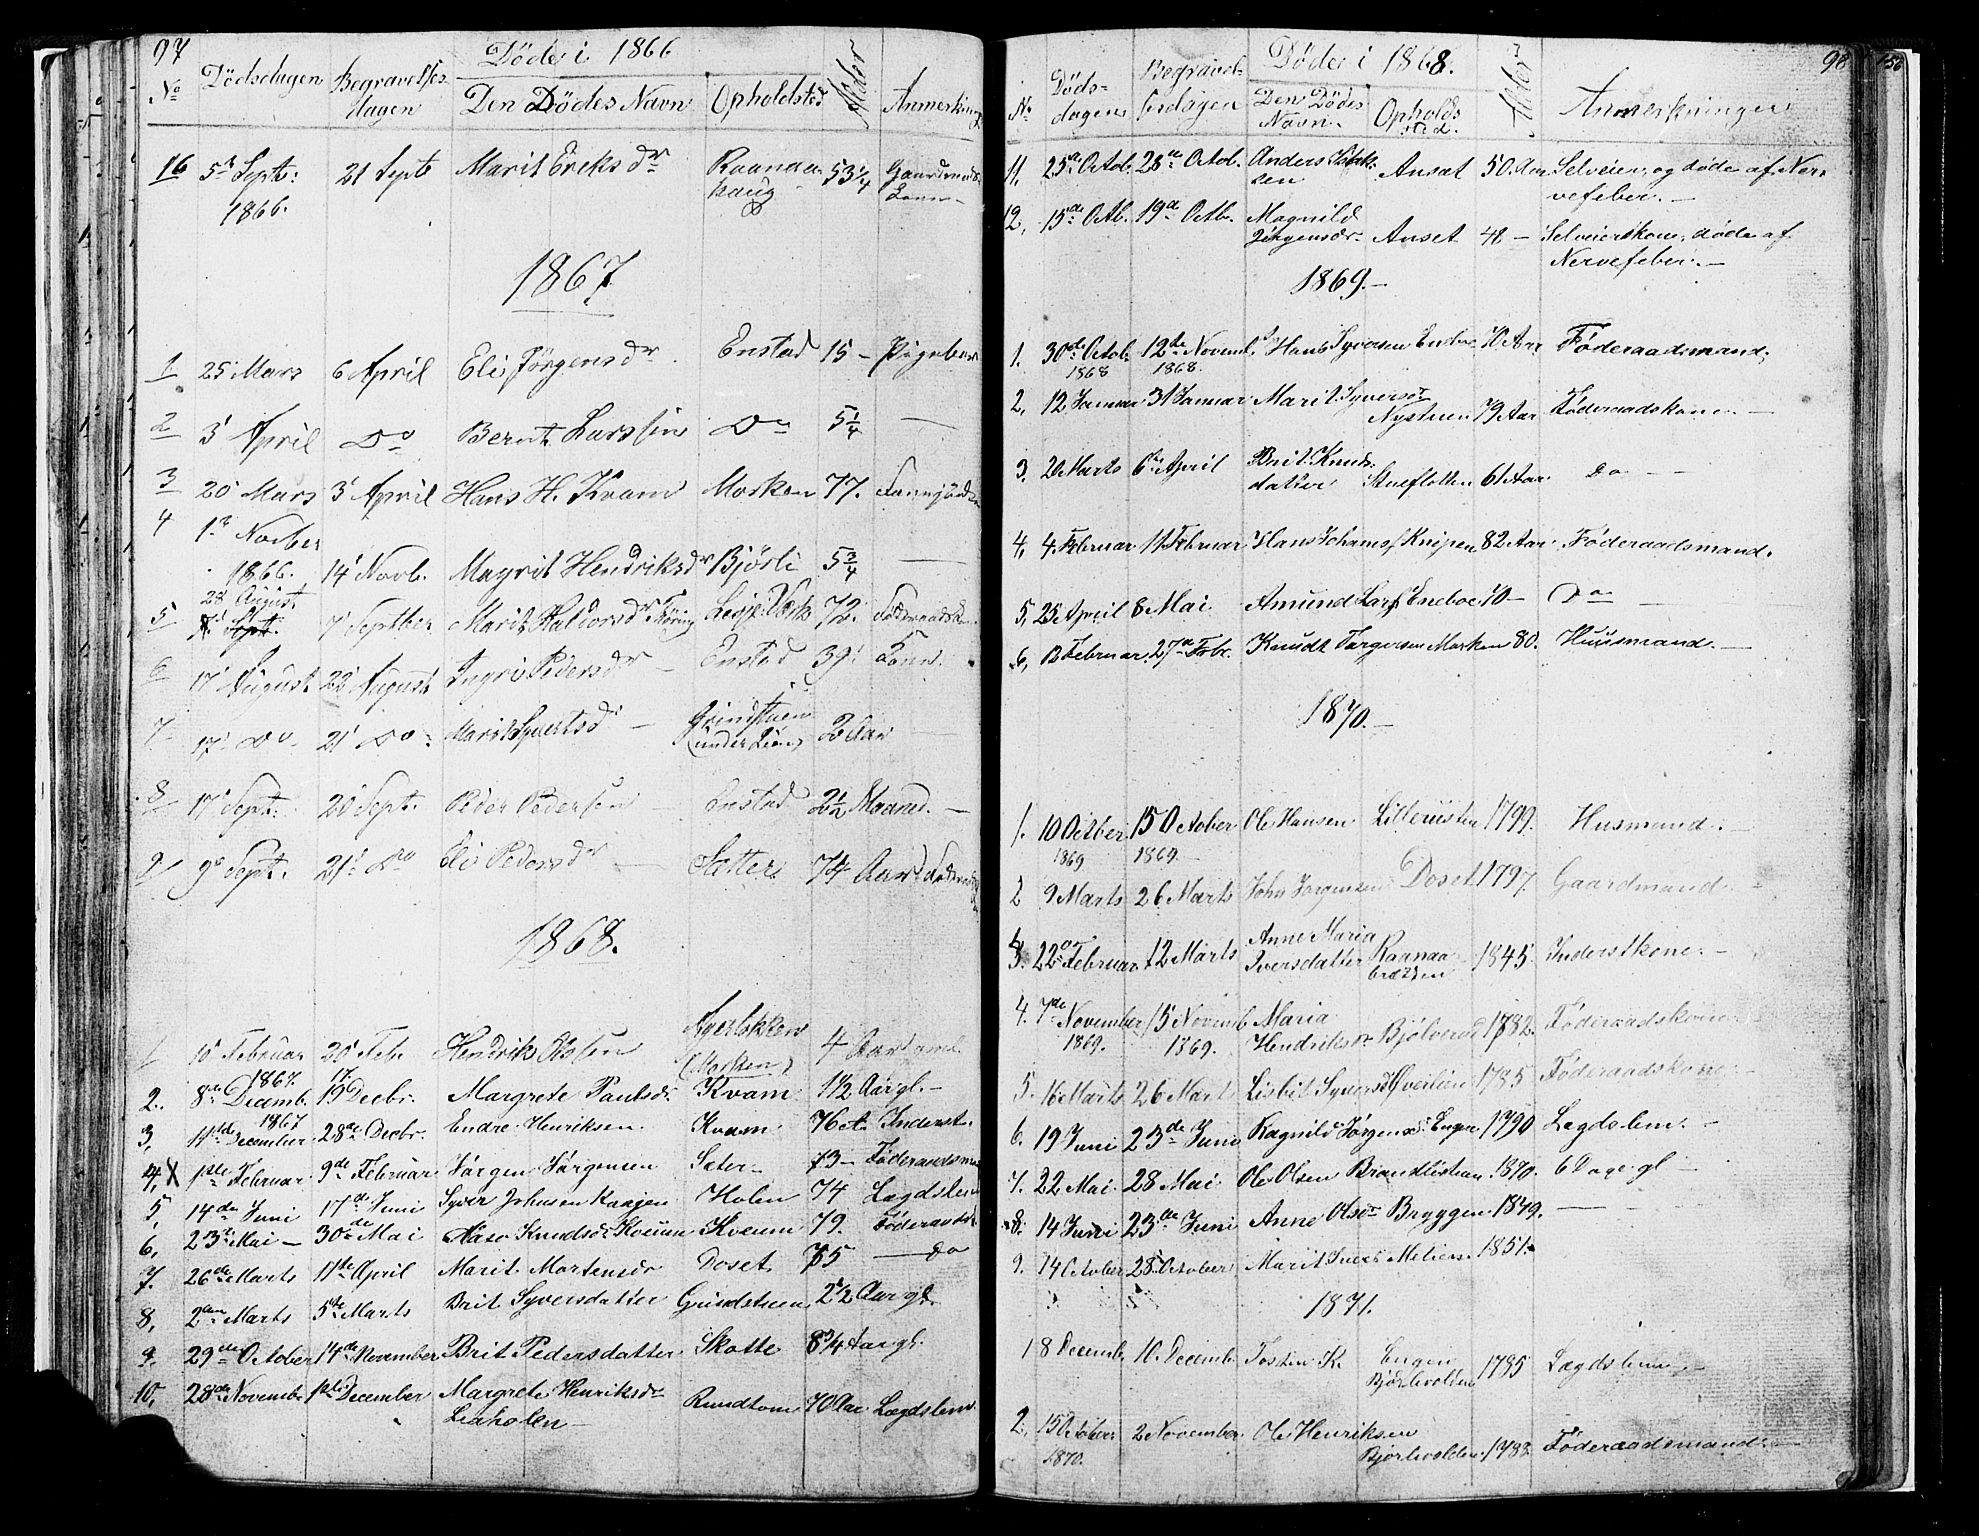 SAH, Lesja prestekontor, Klokkerbok nr. 4, 1842-1871, s. 97-98